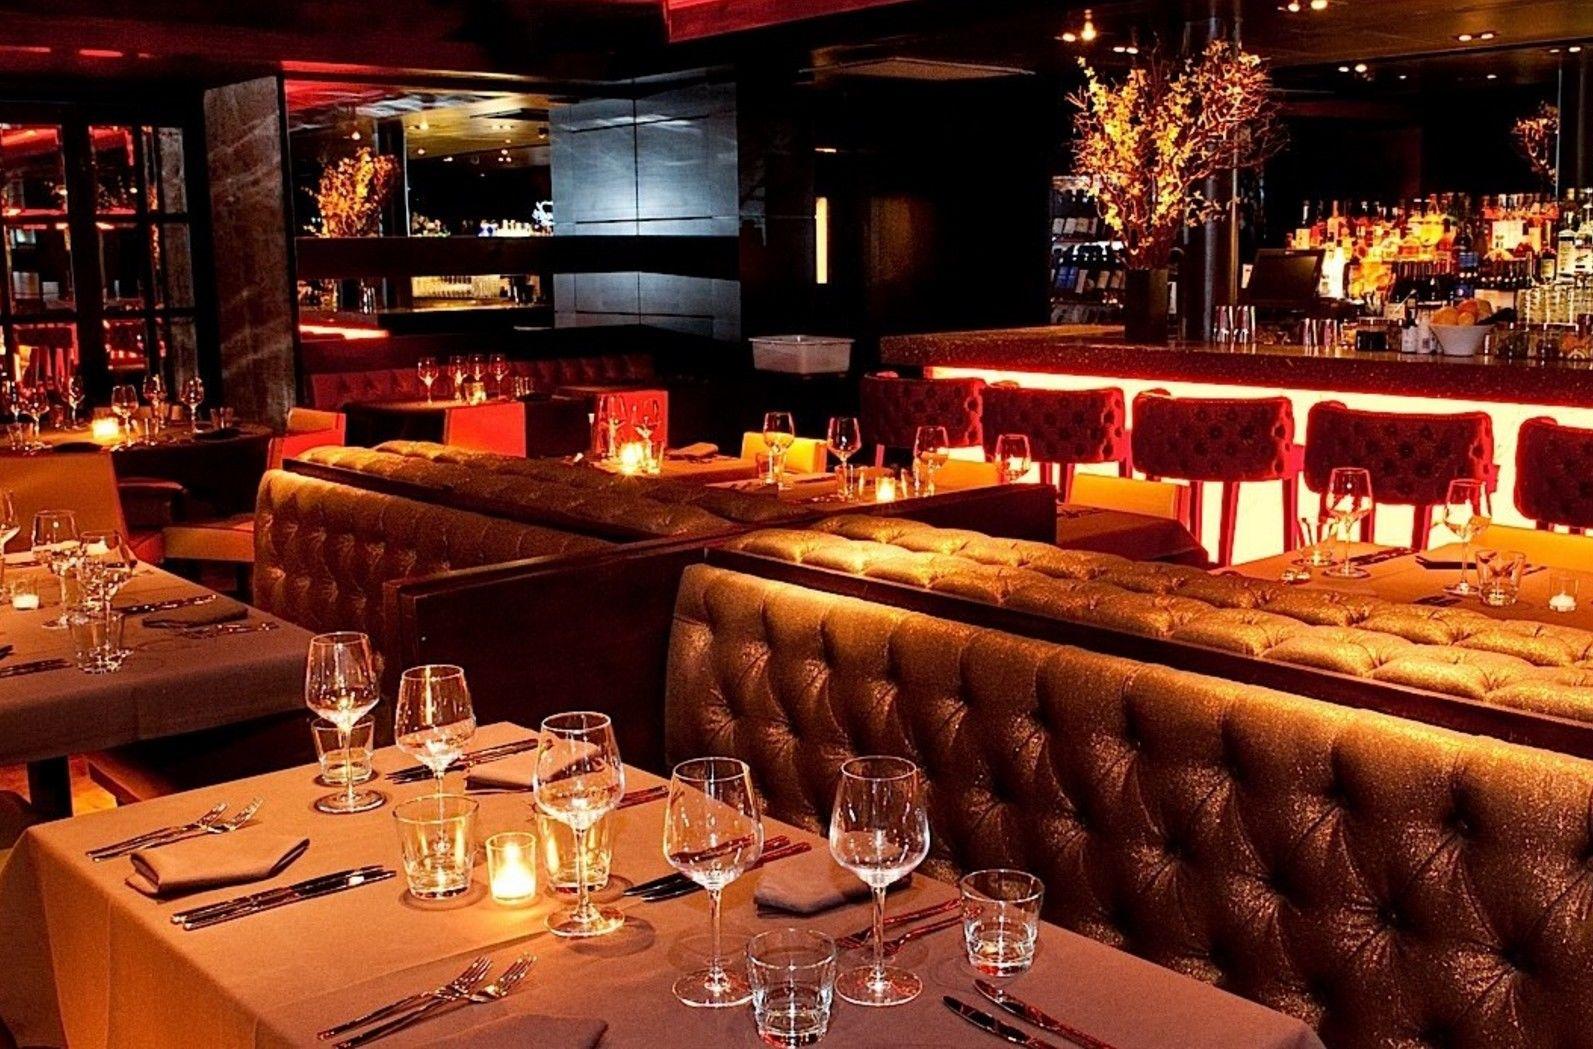 Hotel sanctuary 4 new york etats unis avec voyages leclerc crystal to flex ref 493557 - Hotel avec cuisine new york ...